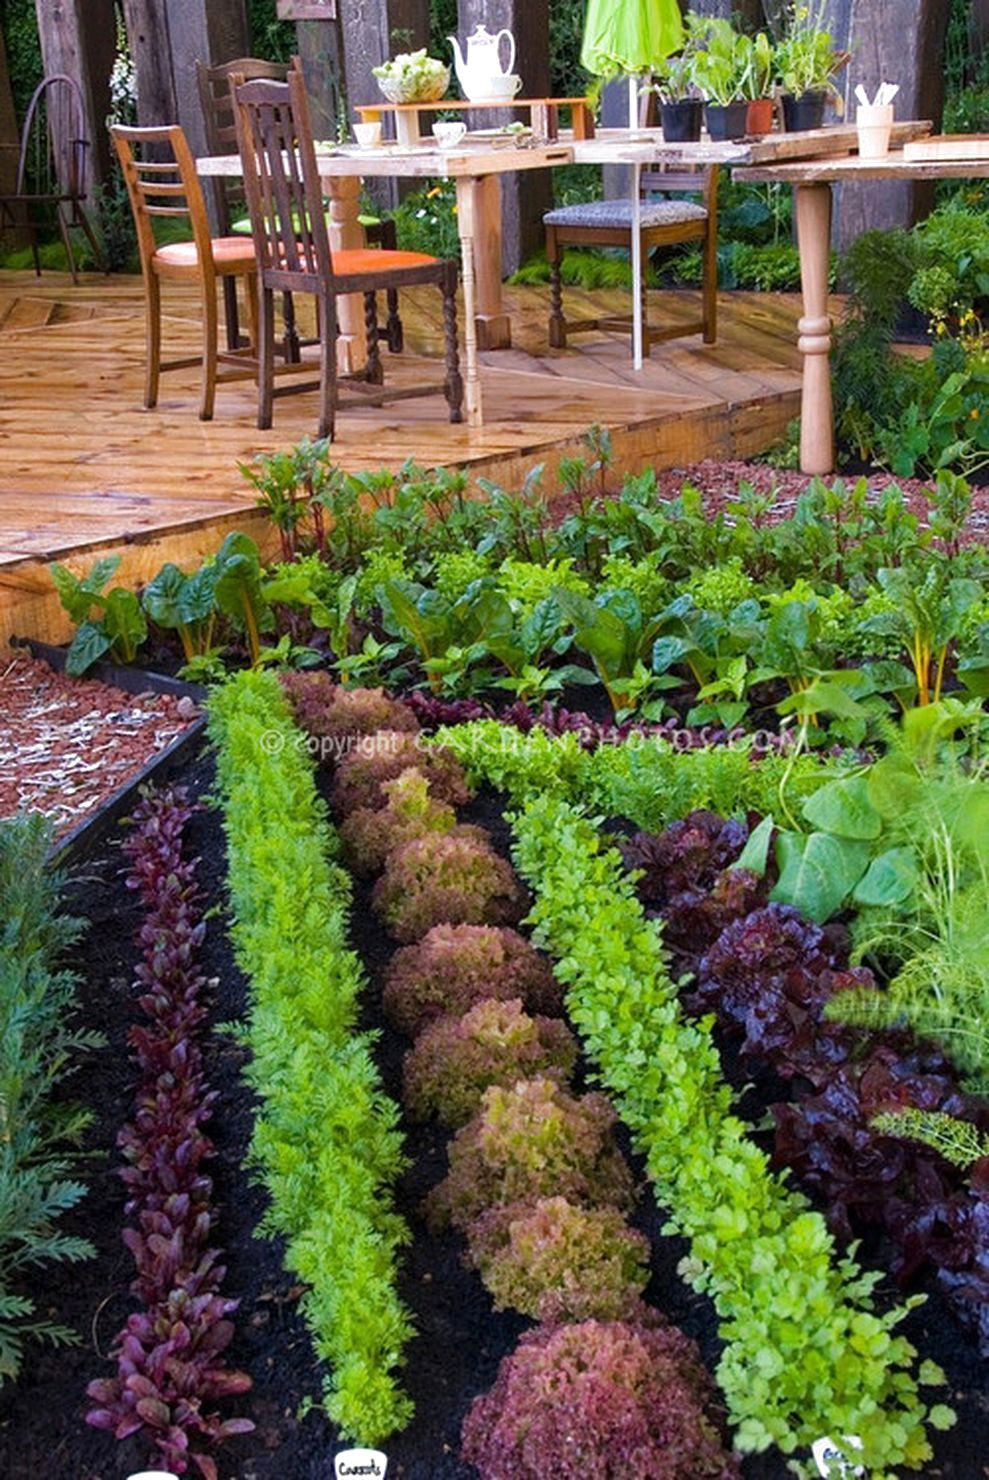 56 Very Beautiful Backyard Vegetable Garden Designs Ideas Vegetable Garden Design Small Vegetable Gardens Garden Layout Vegetable